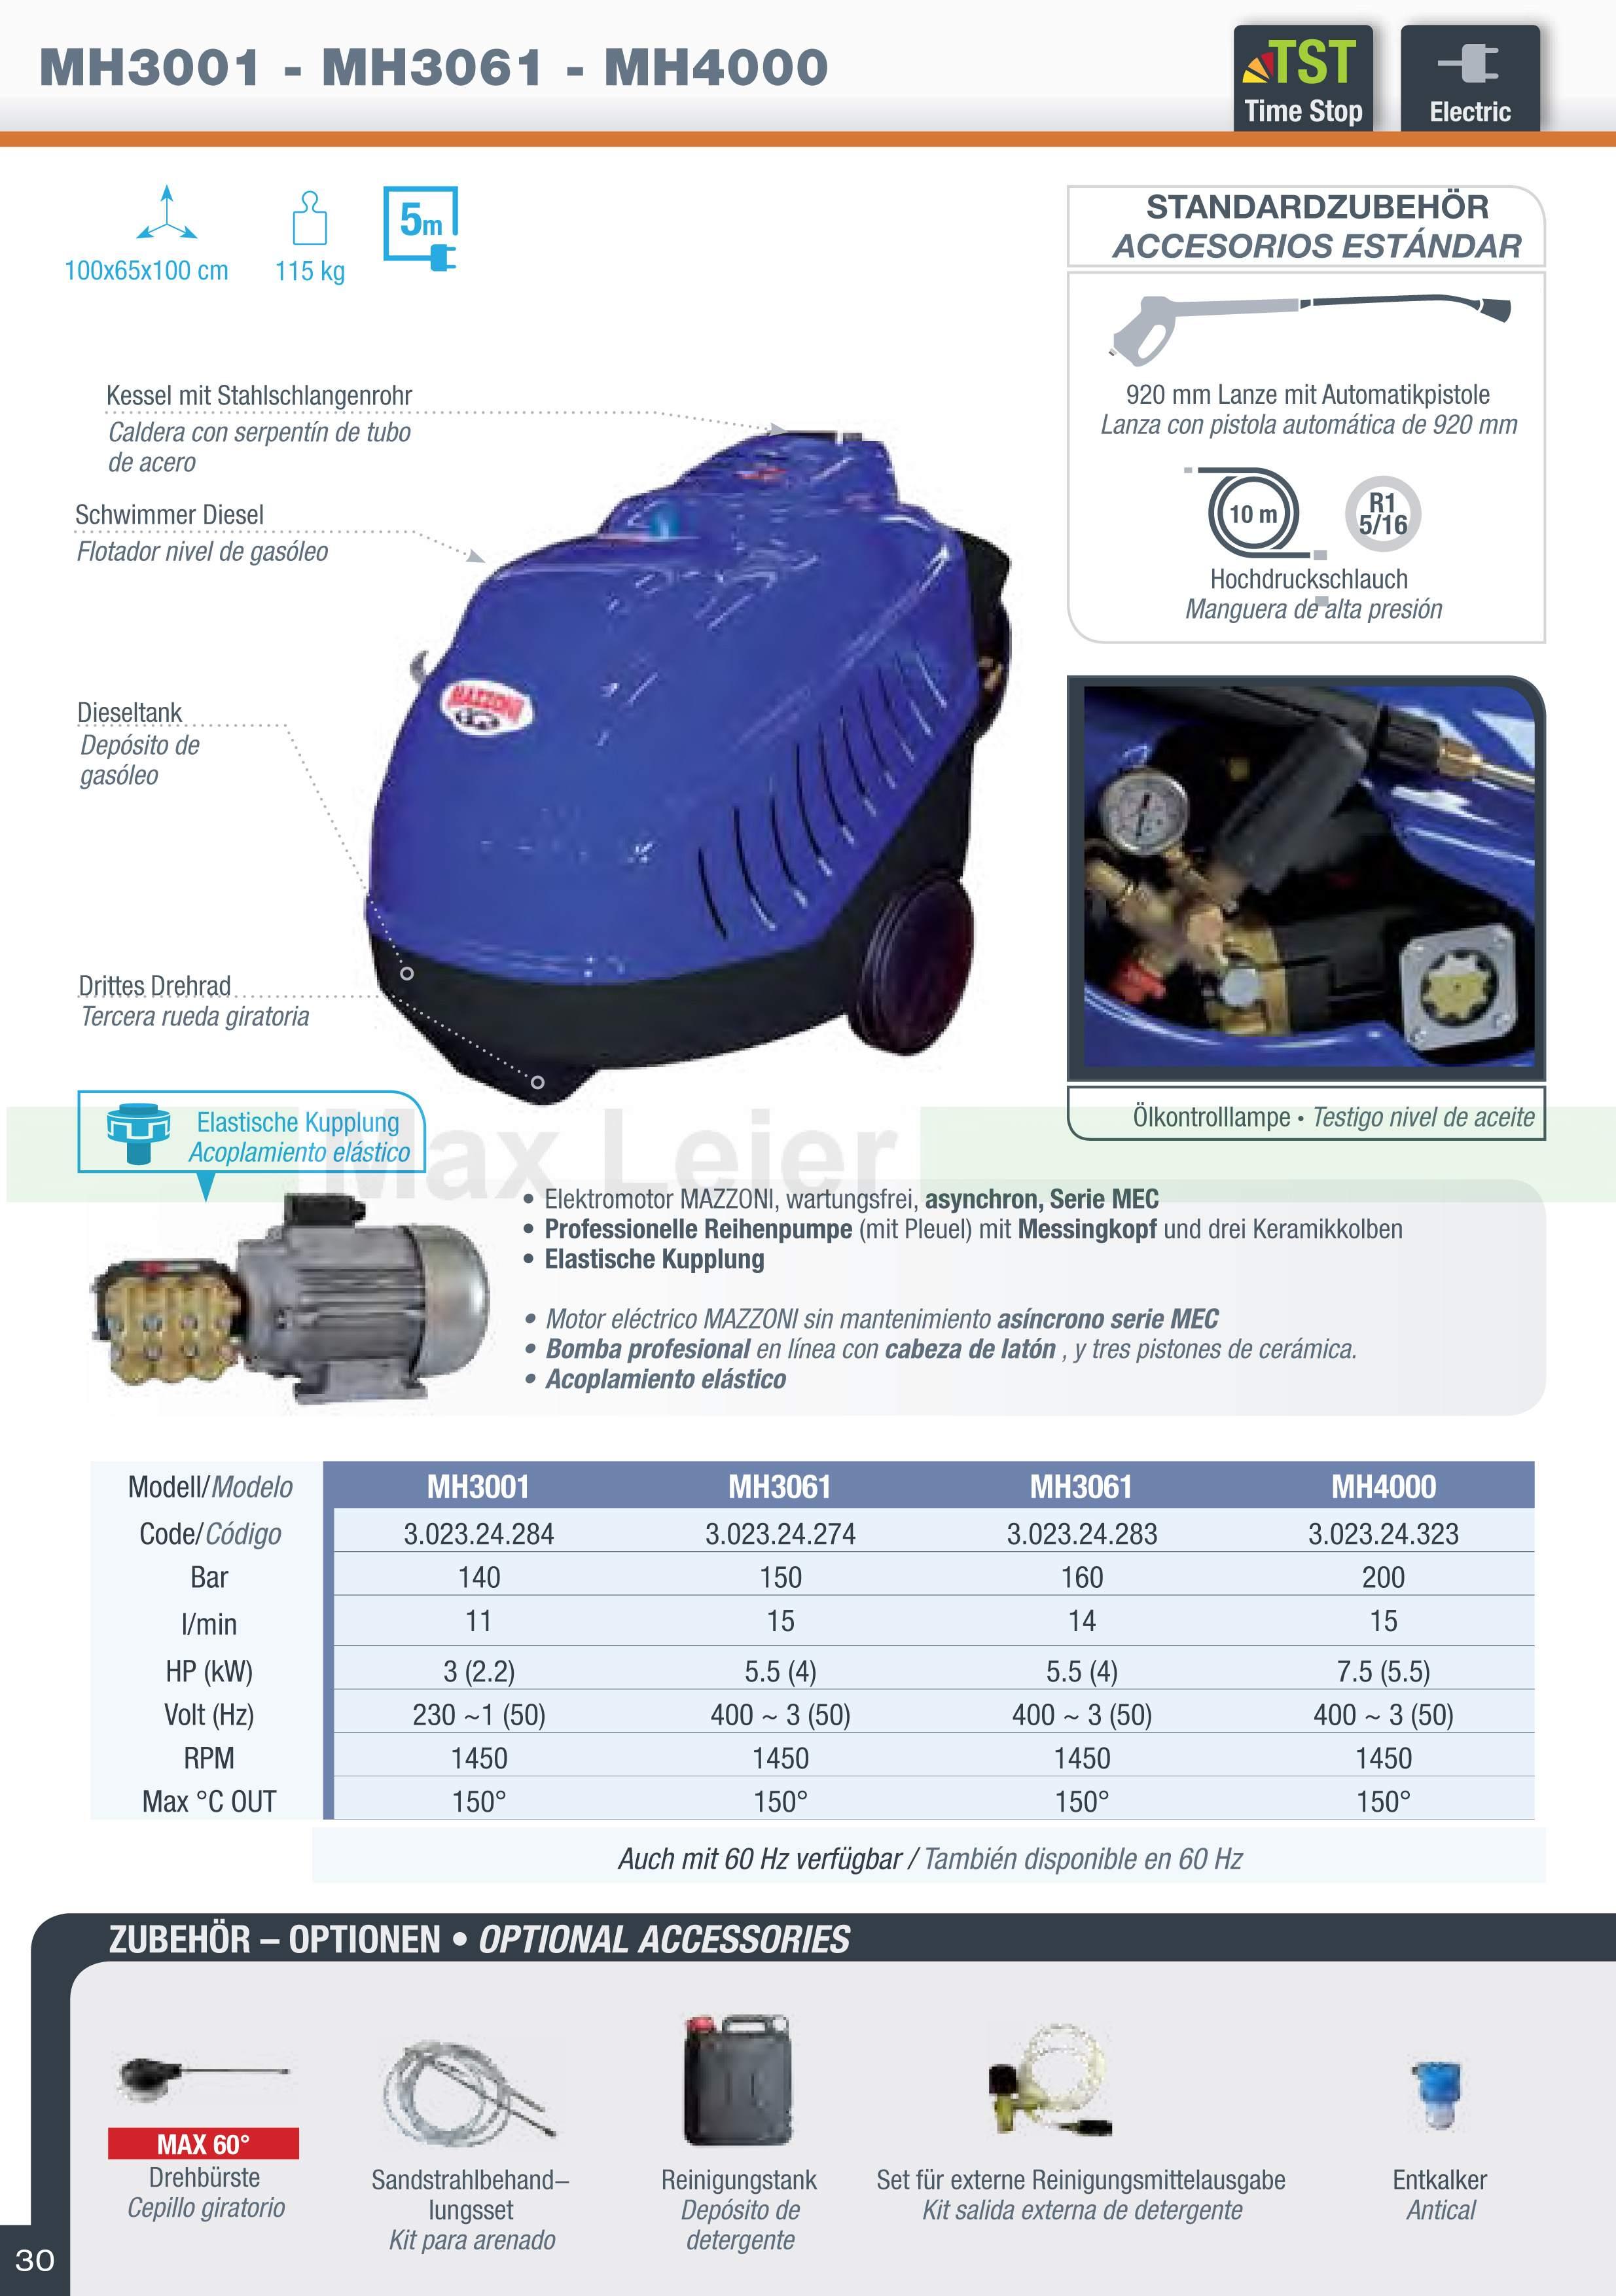 S30-Mazzoni-MH3001-MH3061-MH4000